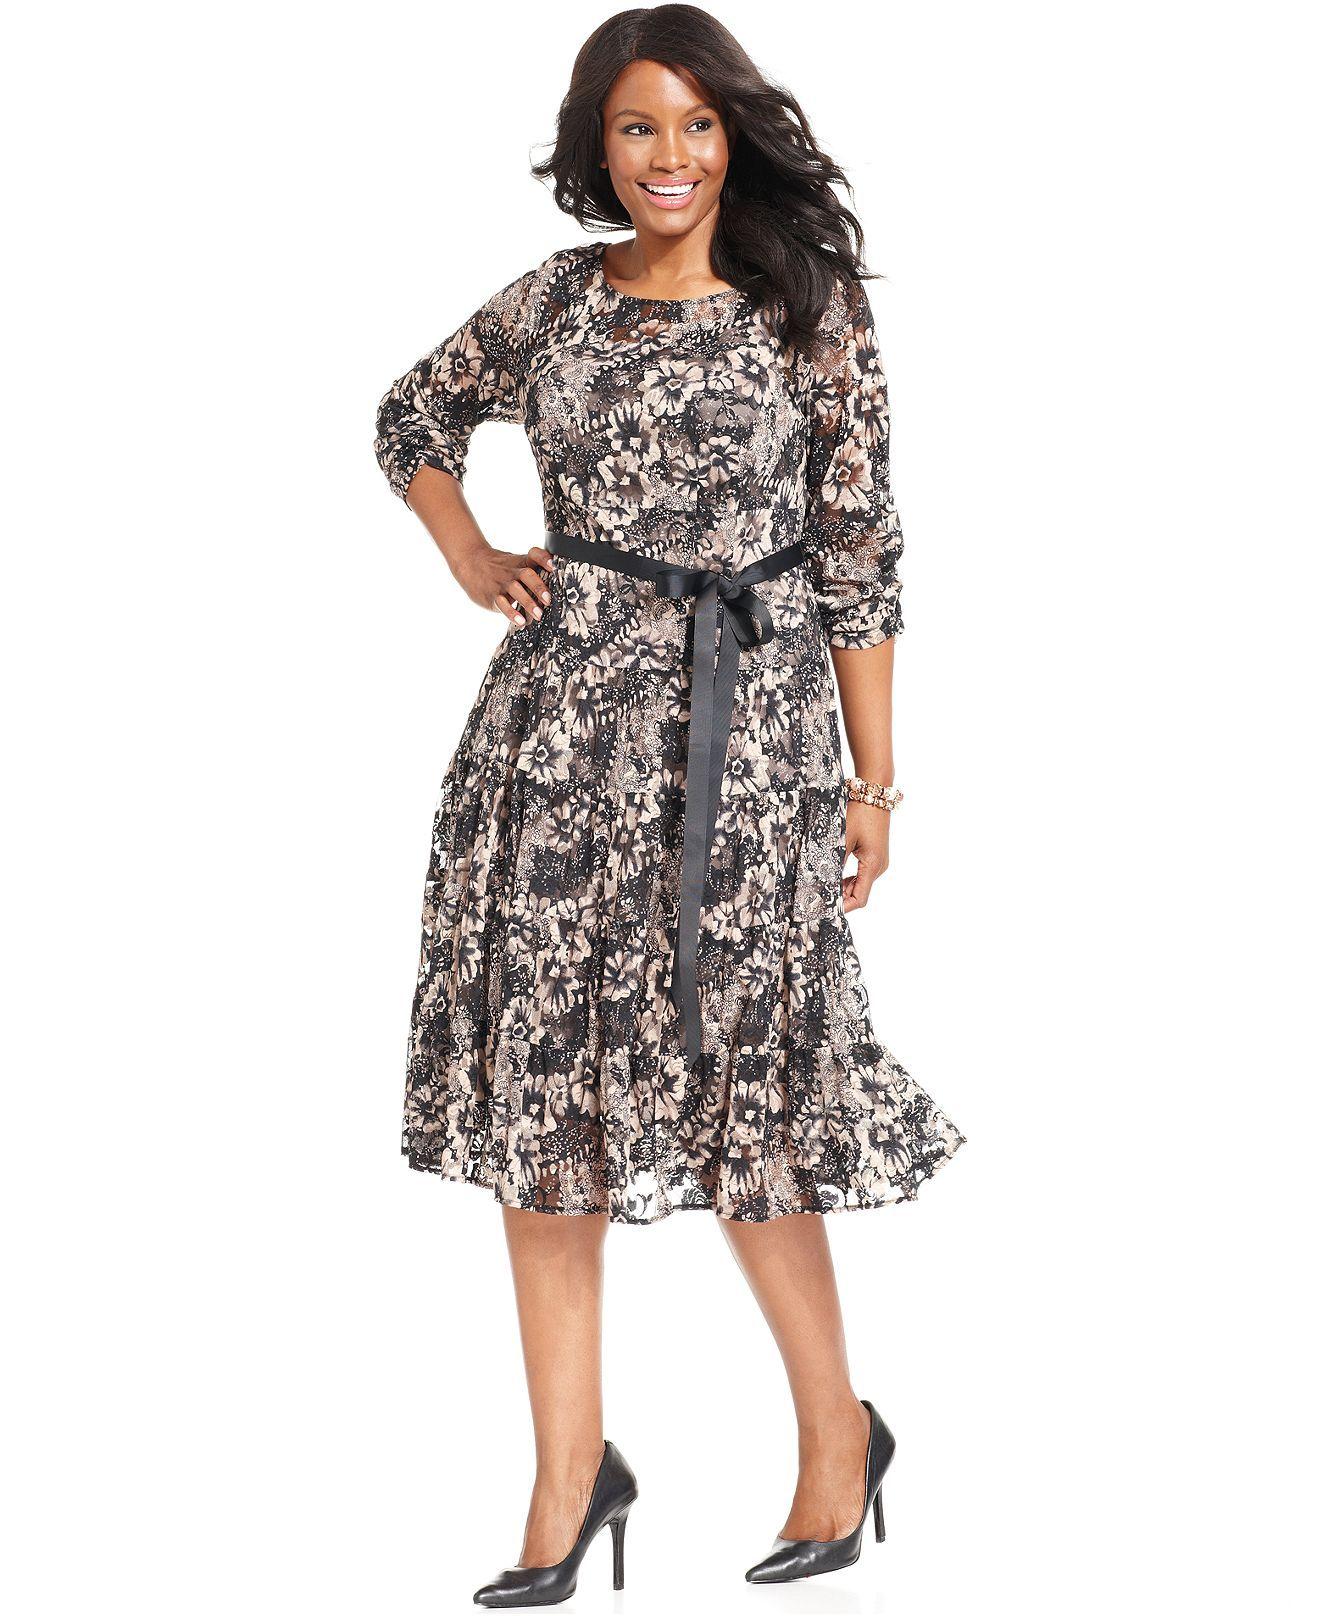 3b79c72c2a35d SL Fashions Plus Size Dress